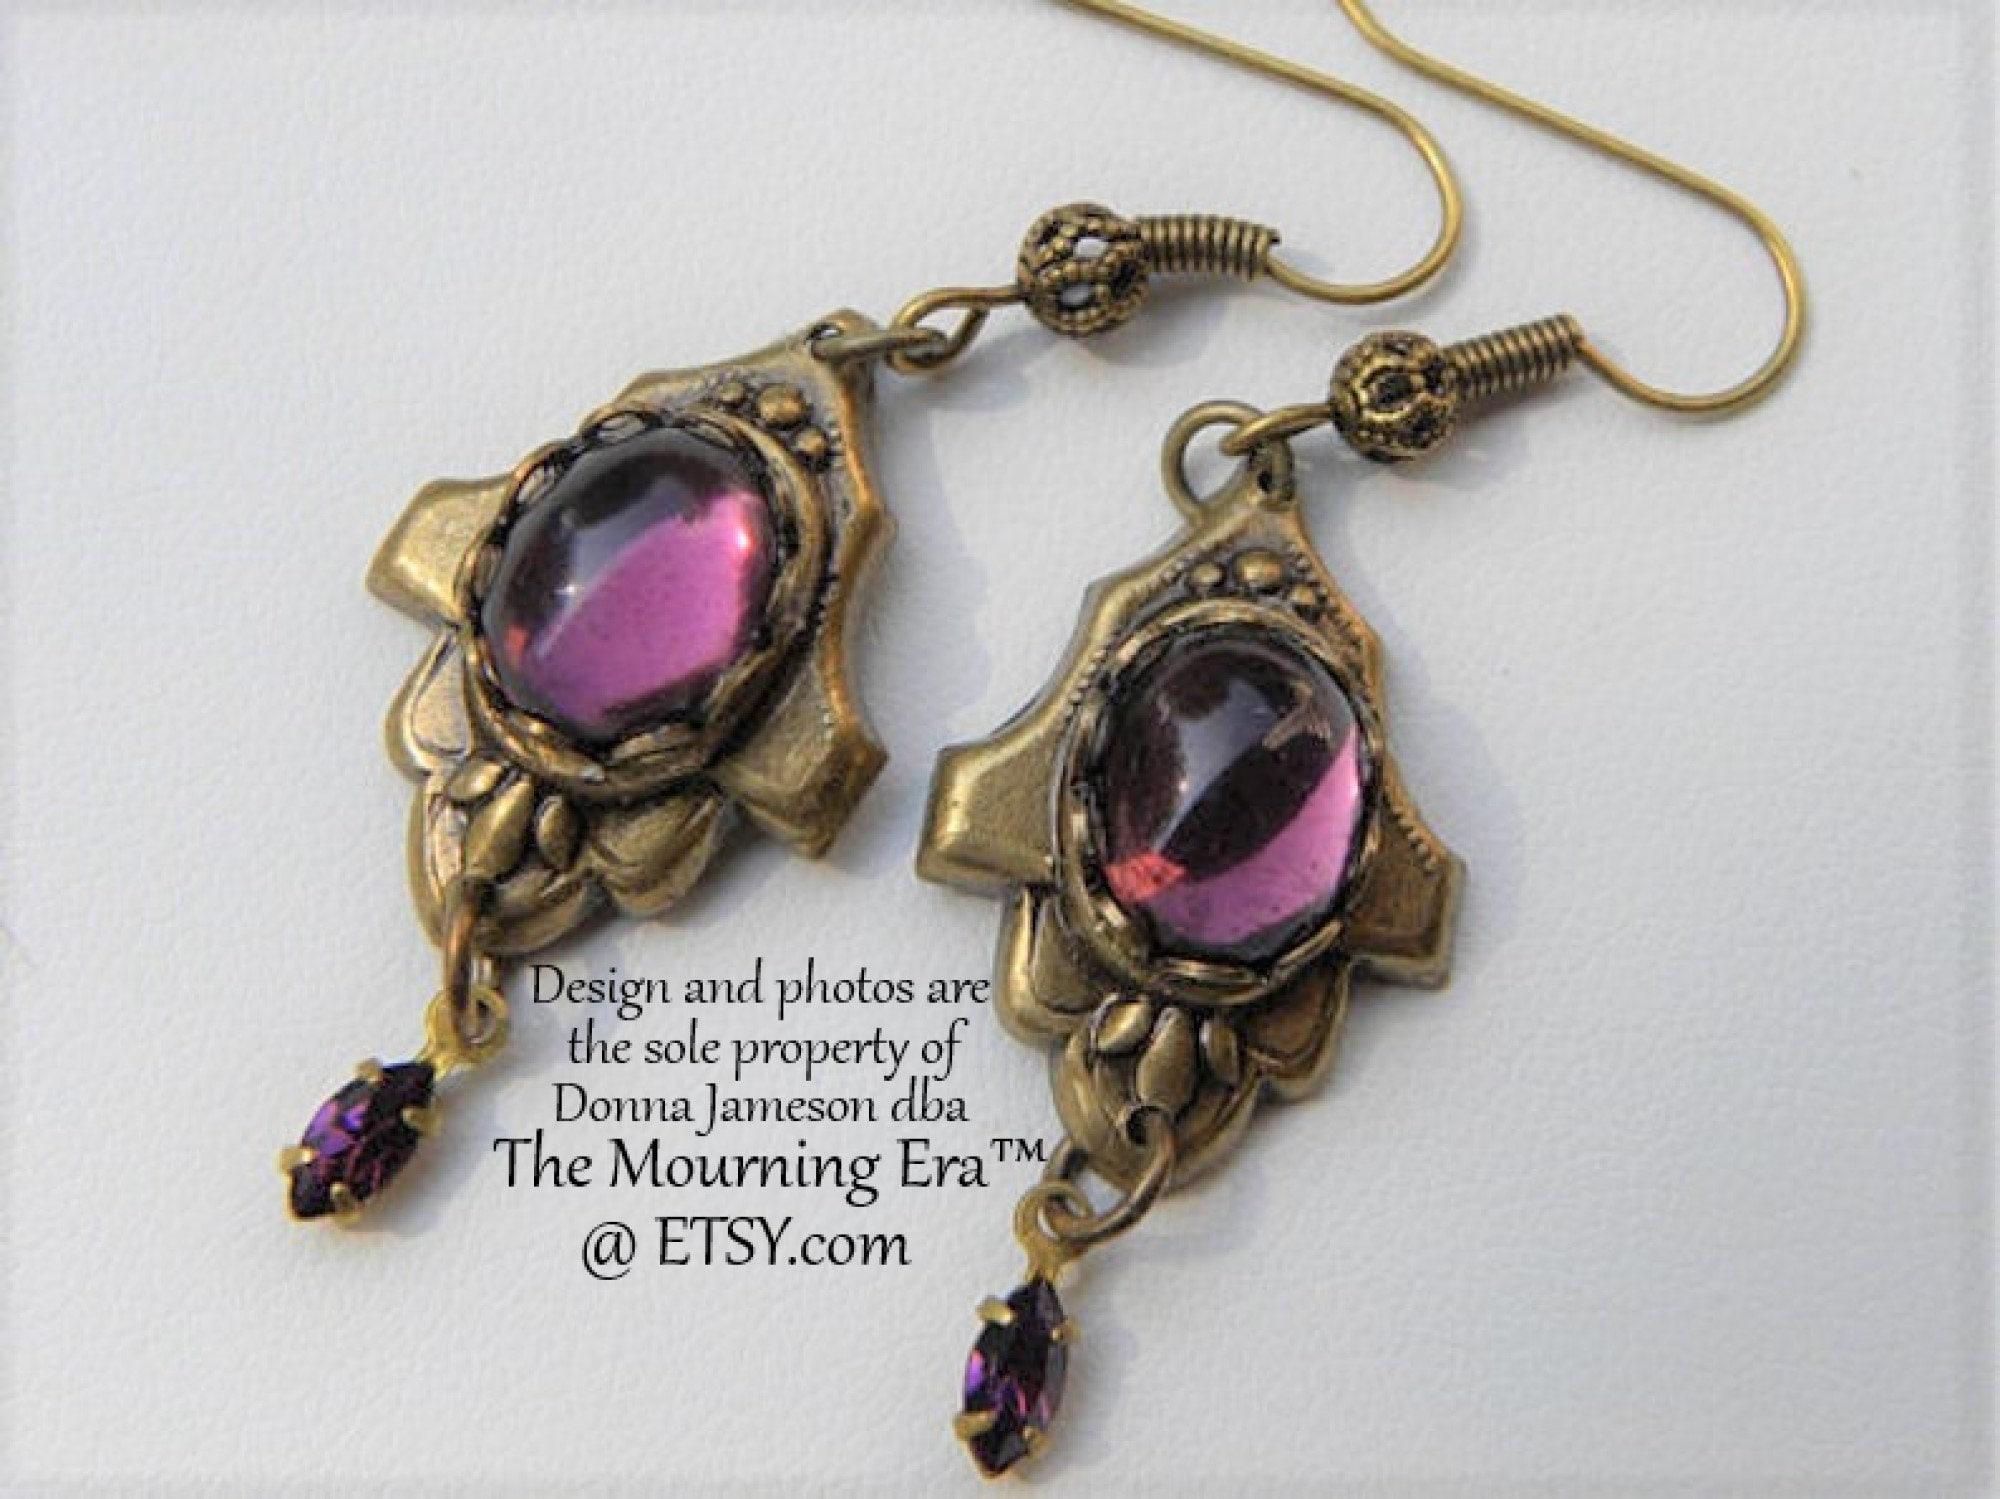 Victorian Mourning Earrings Gothic Long Slender Spike Dangles Pit Pendulum Horror Gift \u00ae\u00a92016DJ Shabby Goth Victorian Hand Bow Earrings